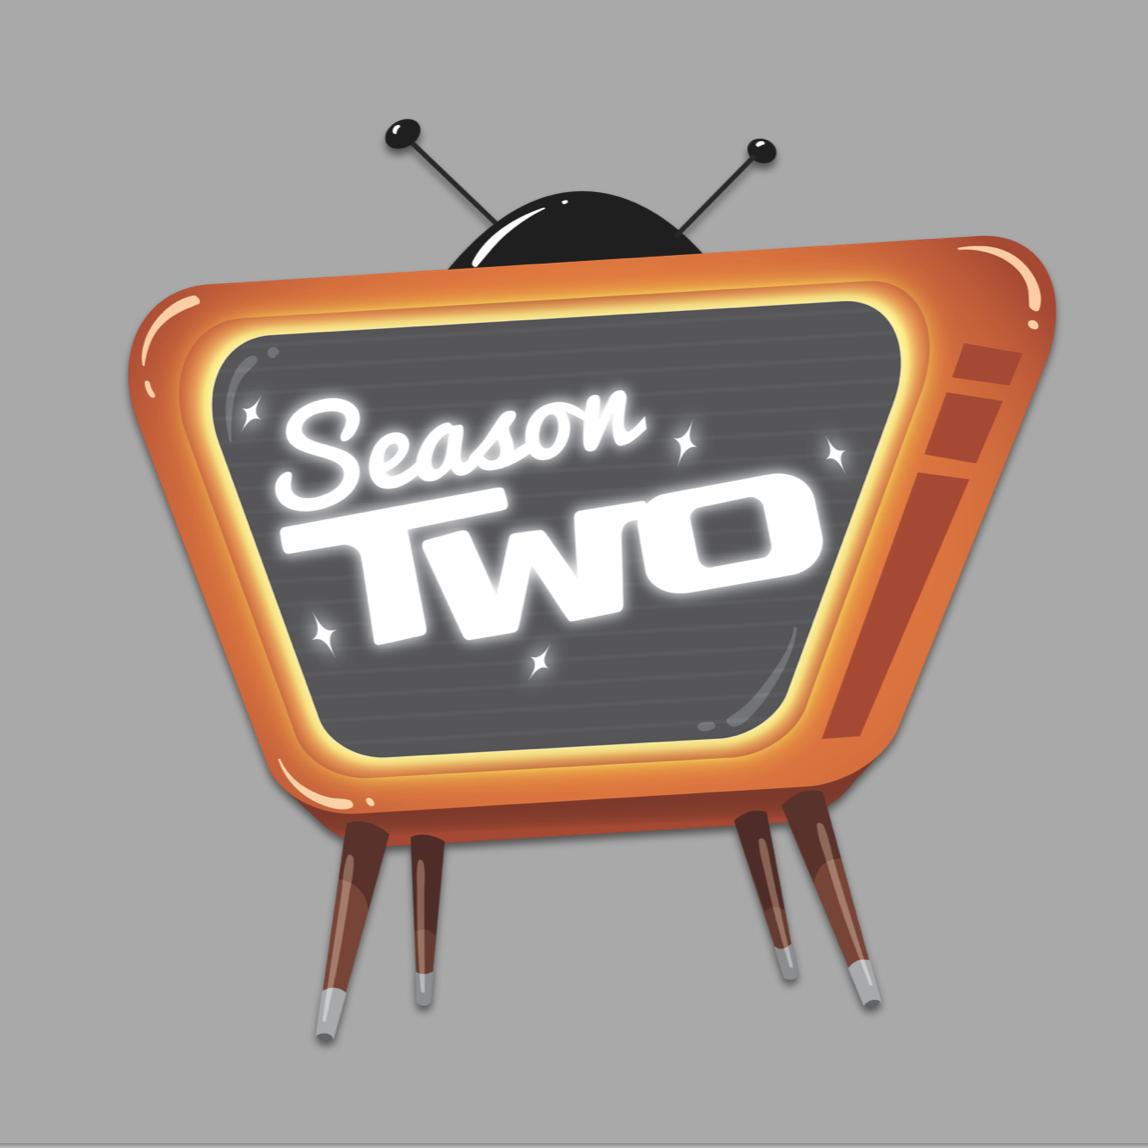 SEASON TWO (Vocal Act)